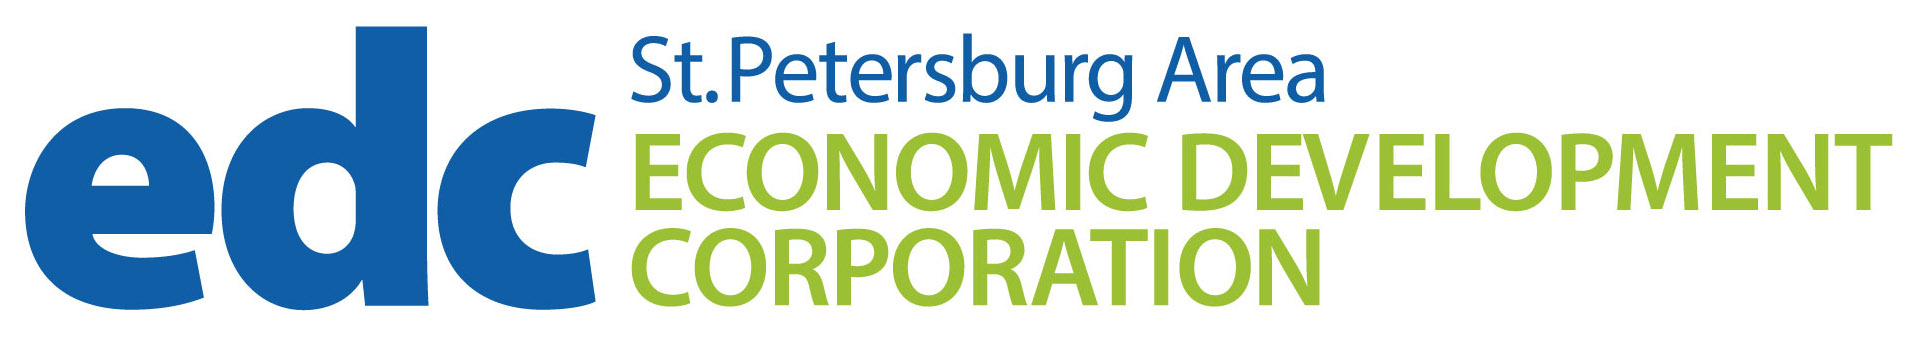 St. Petersburg Area Economic Development Corporation